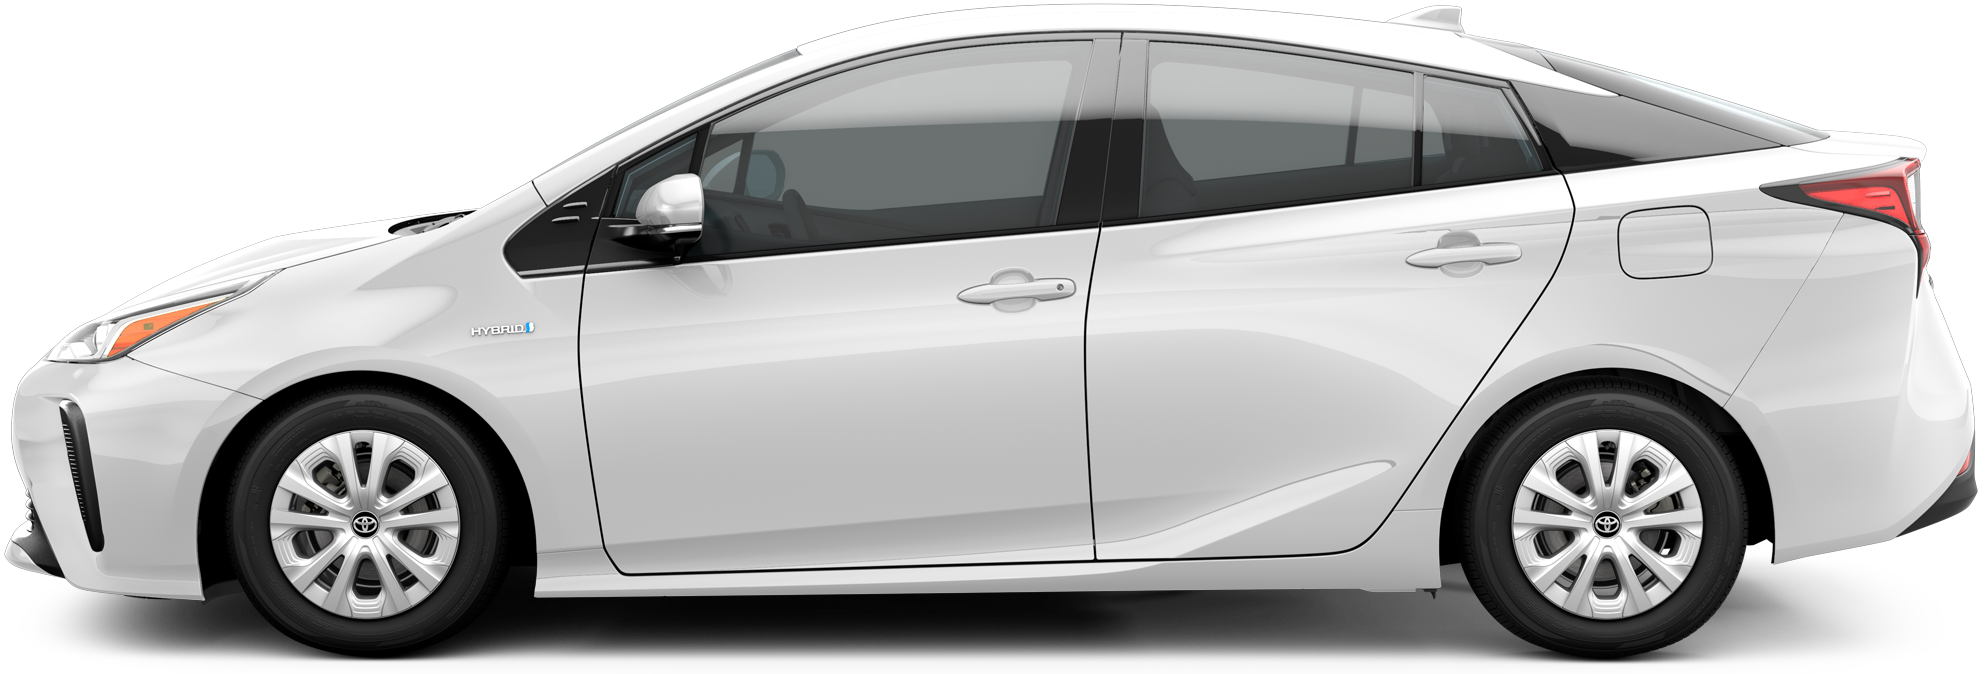 2019 Toyota Prius Hatchback L